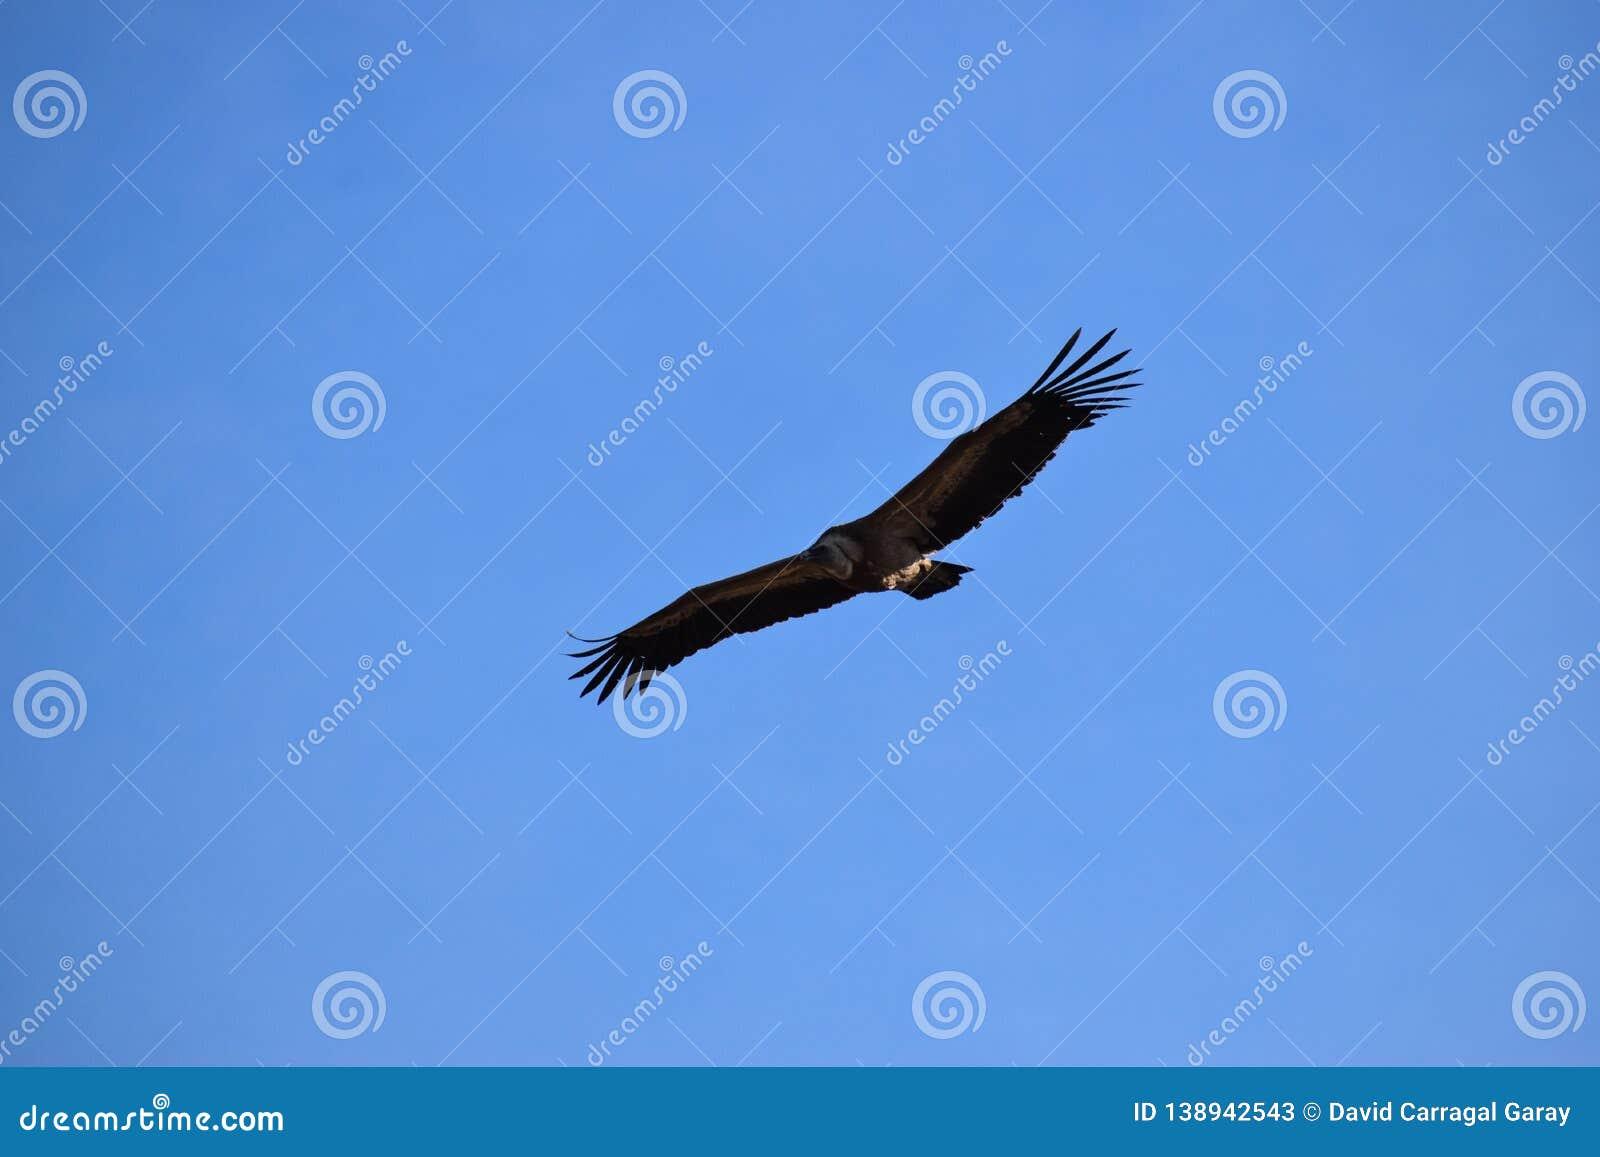 Griffon vulture on the sky